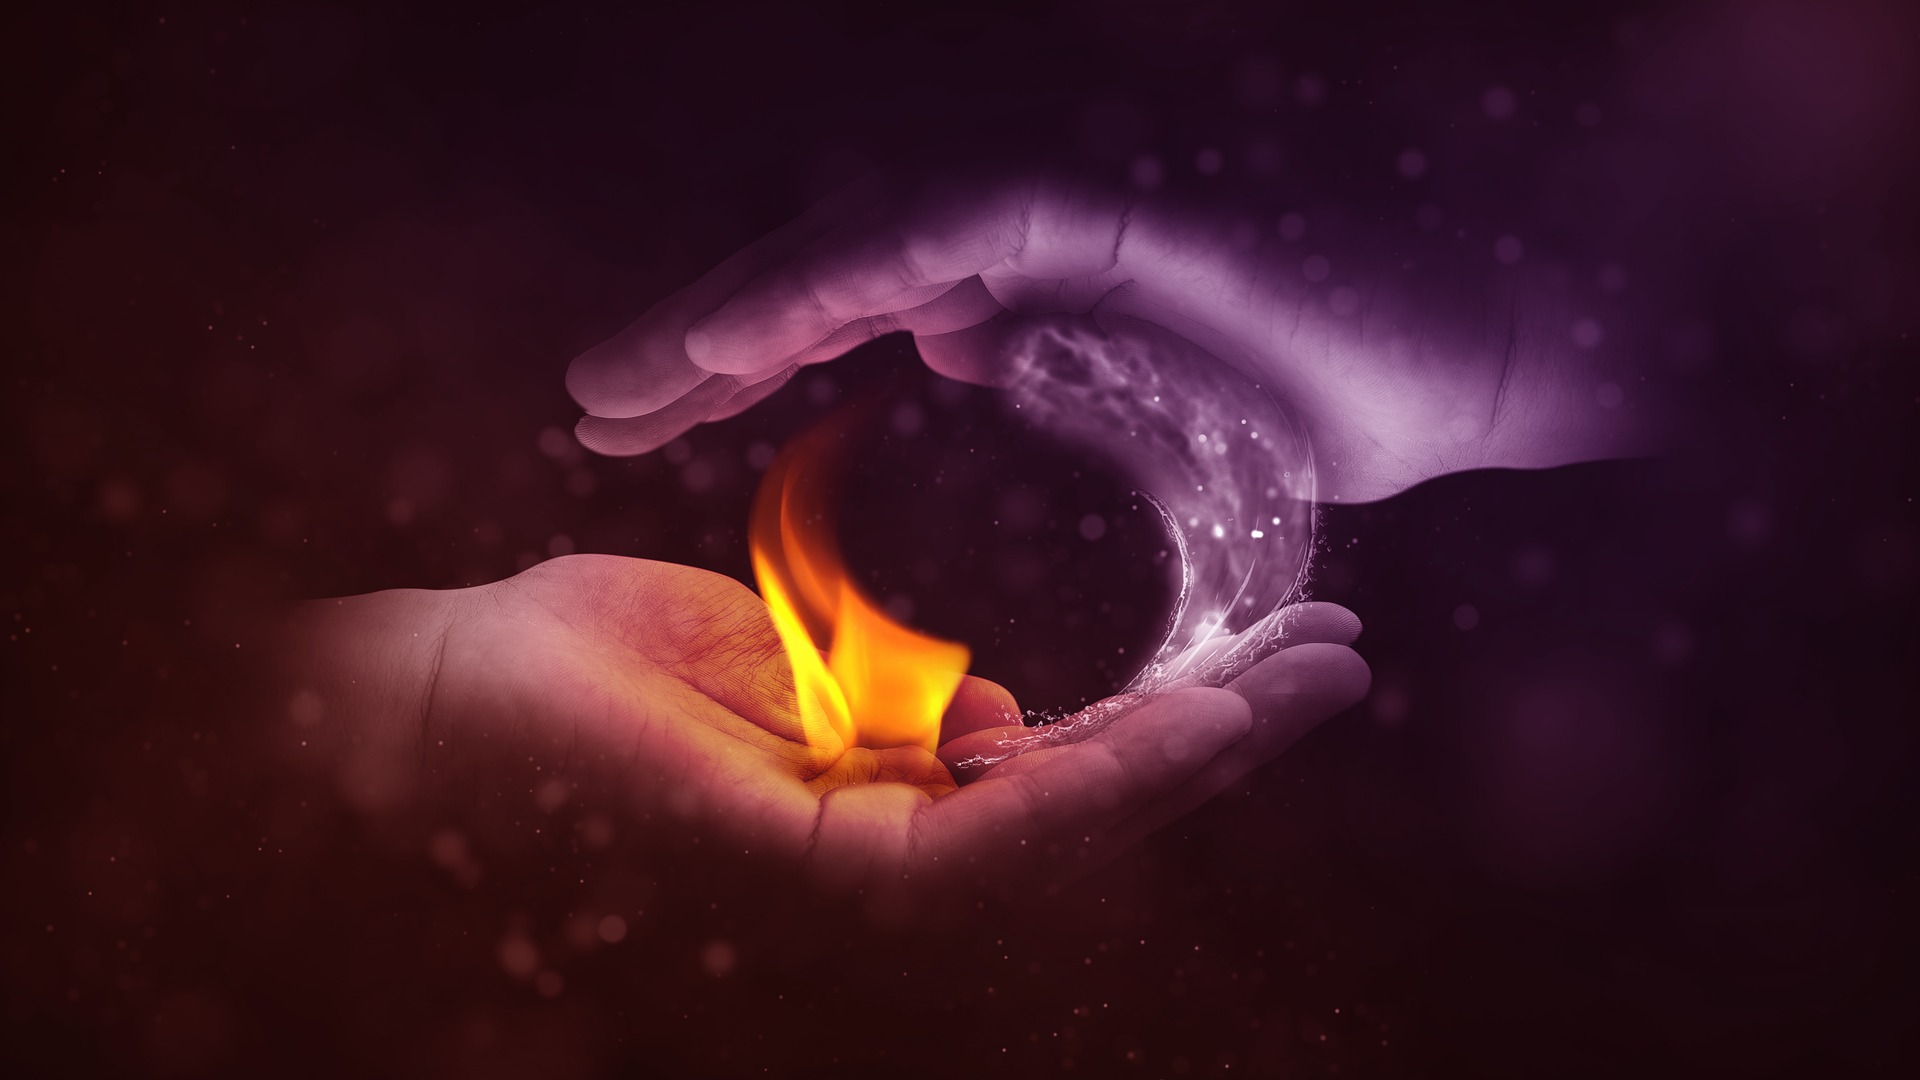 Cum sa-ti protejezi scutul energetic! 4 sfaturi sa nu mai absorbi energia altora